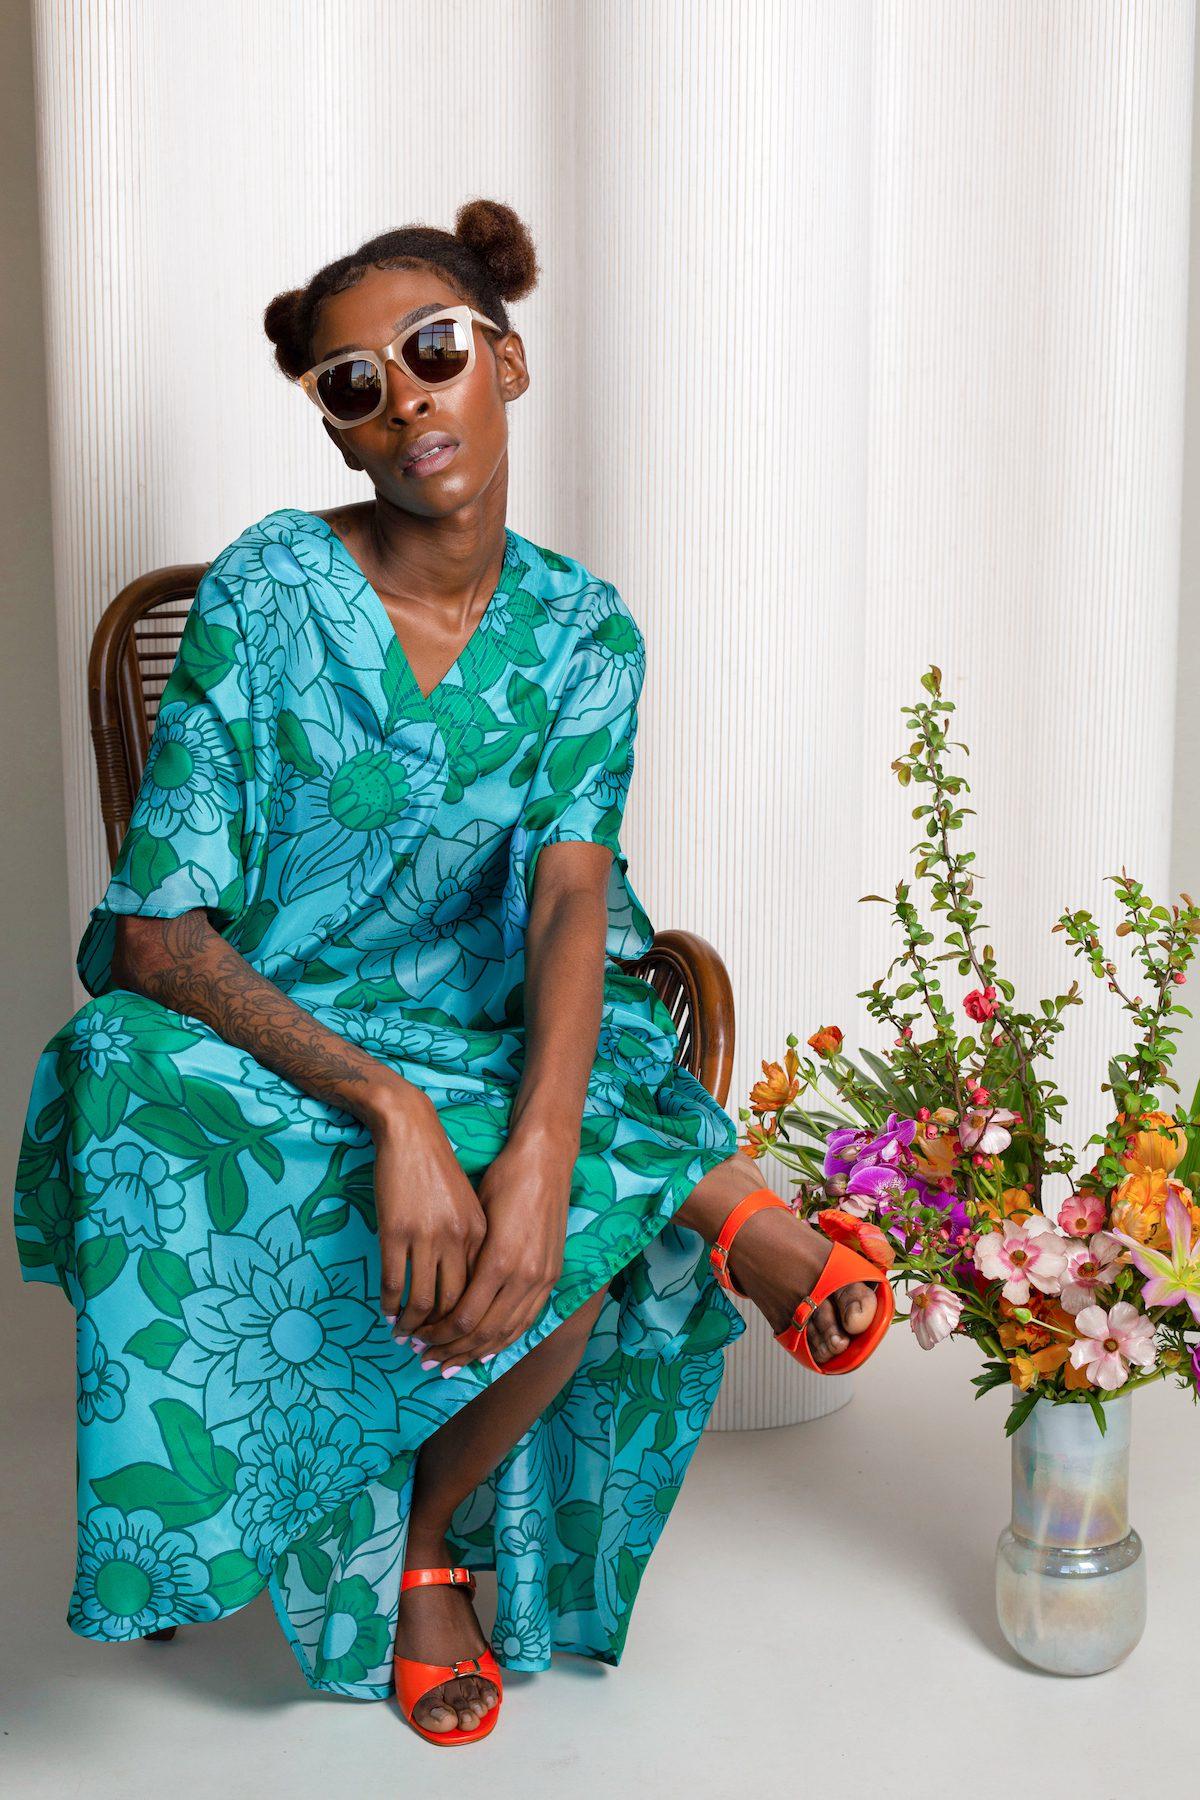 accessories from Vert & Vogue